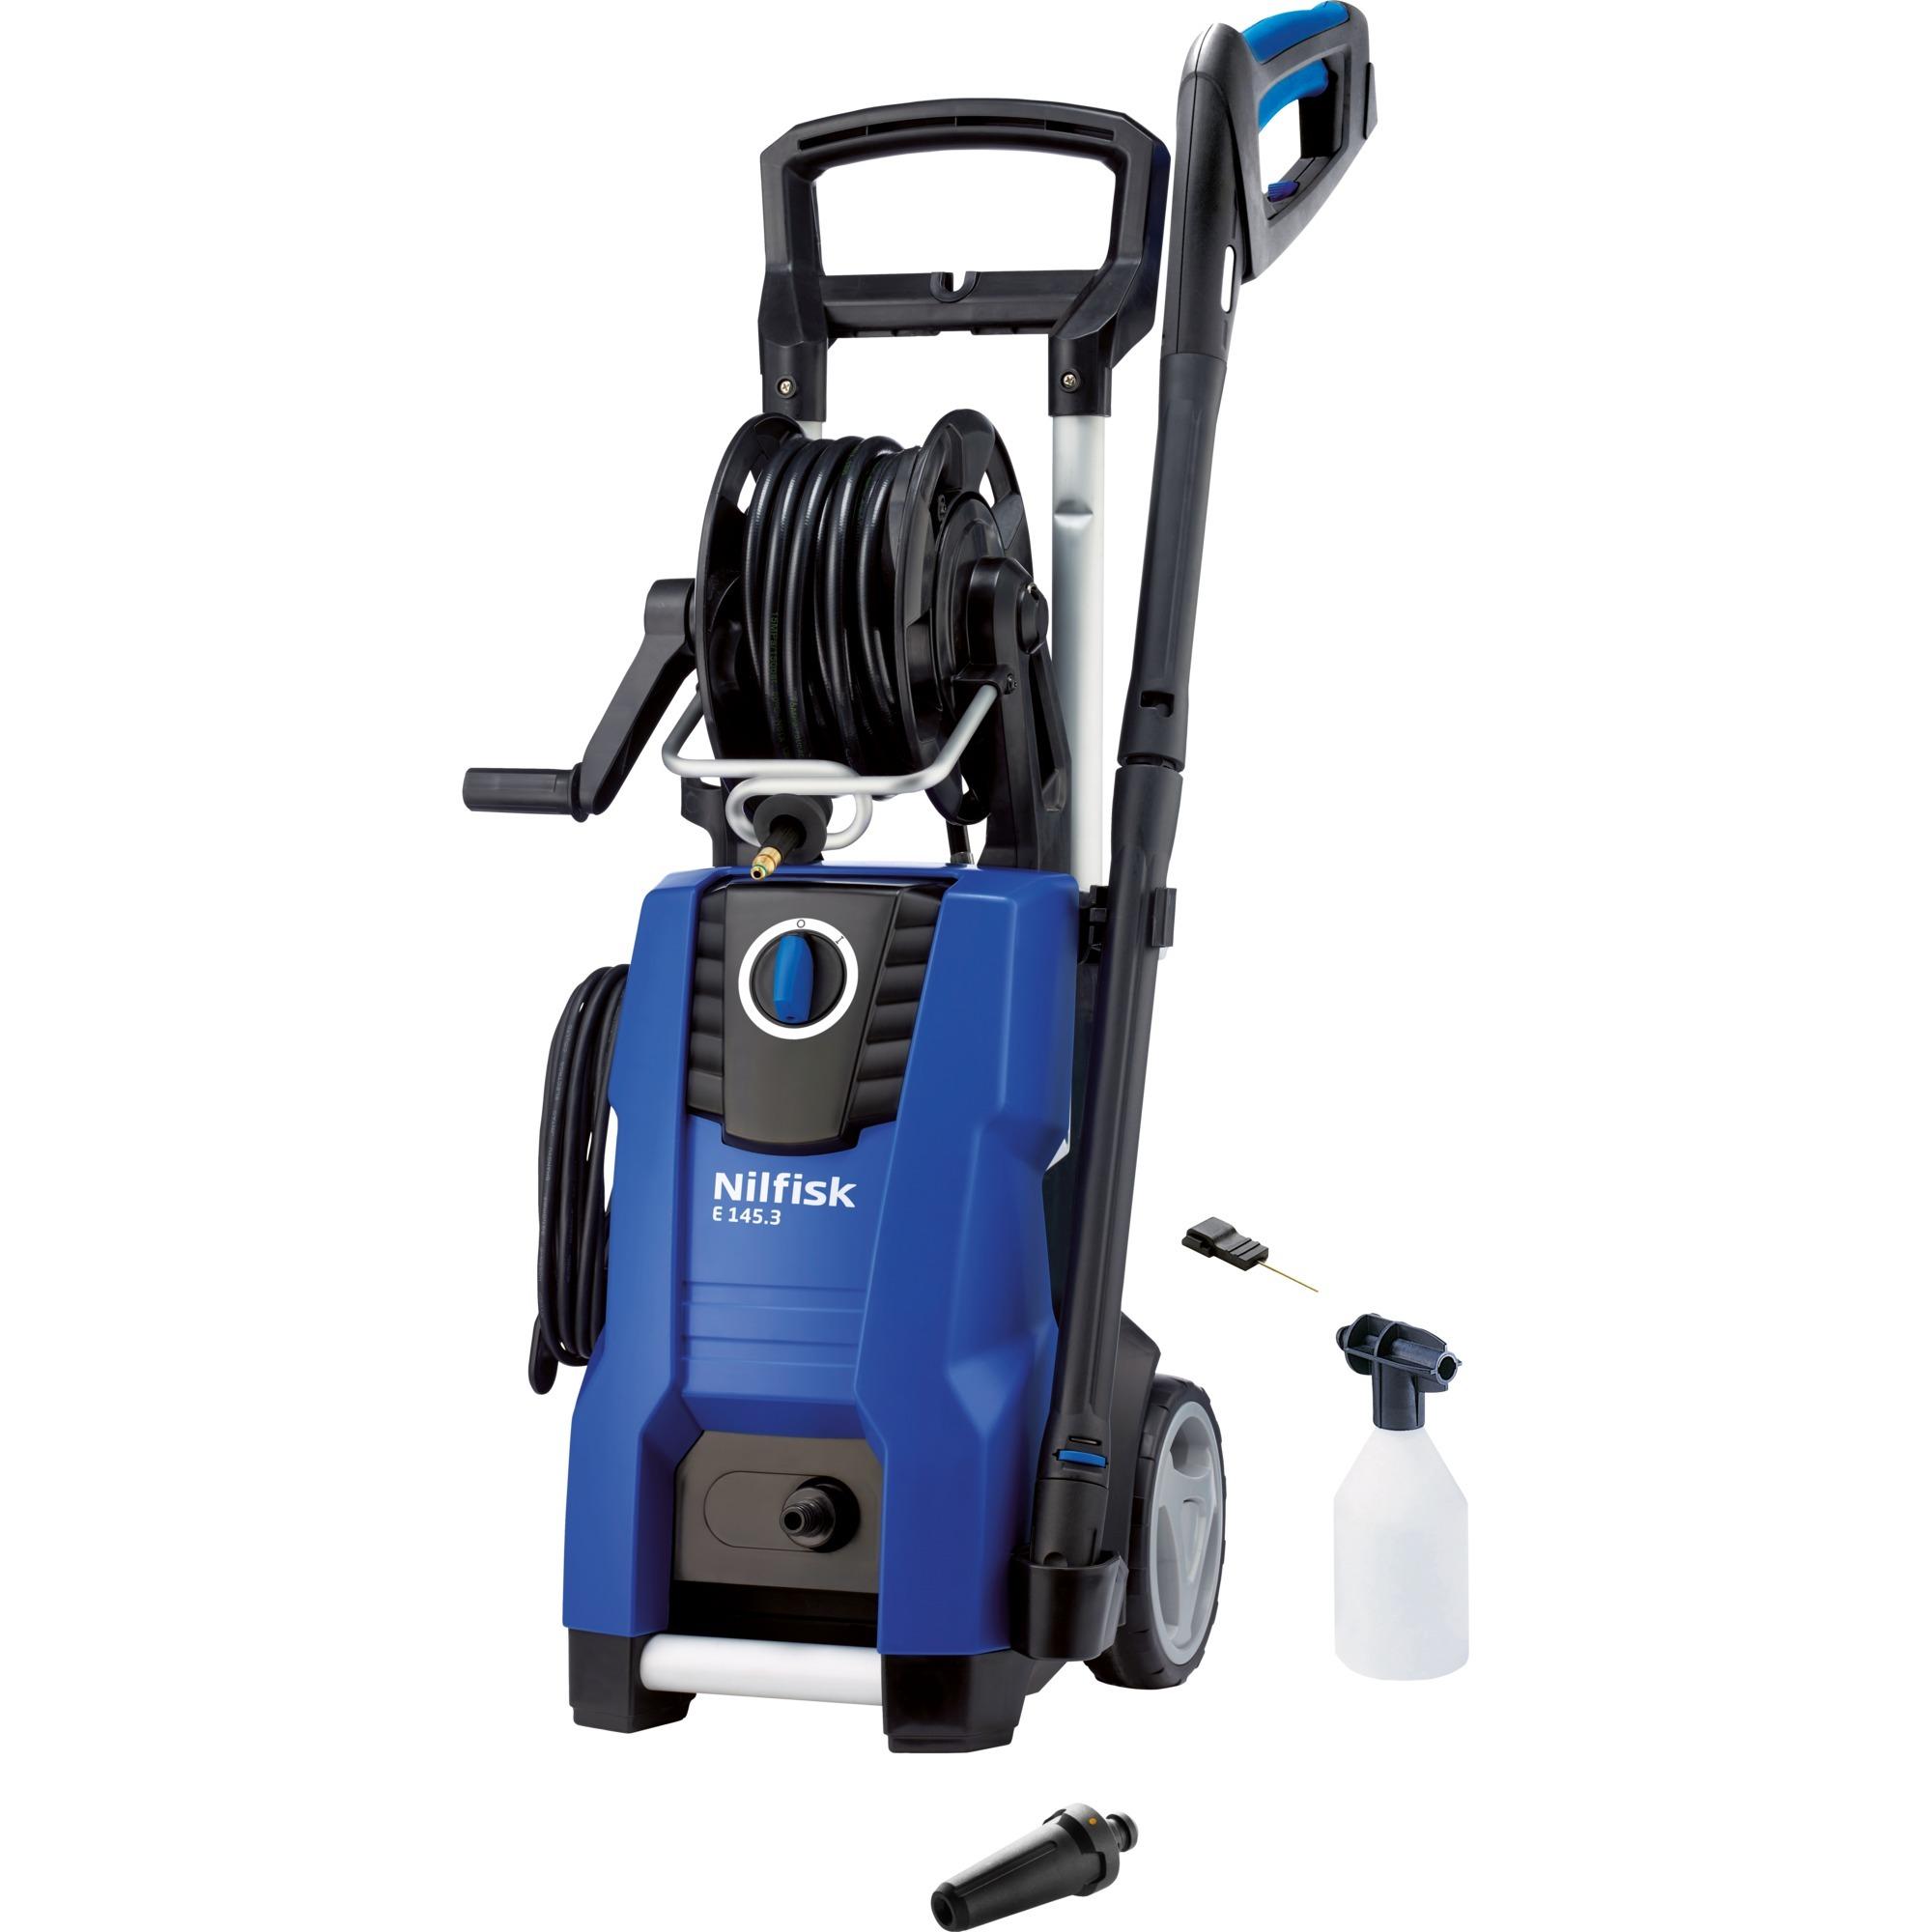 D-PG 130.4-9 X-TRA Vertical Eléctrico 500, 450l/h 2100W Negro, Azul Limpiadora de alta presión o Hidrolimpiadora, Hidrolimpiadora de alta presión